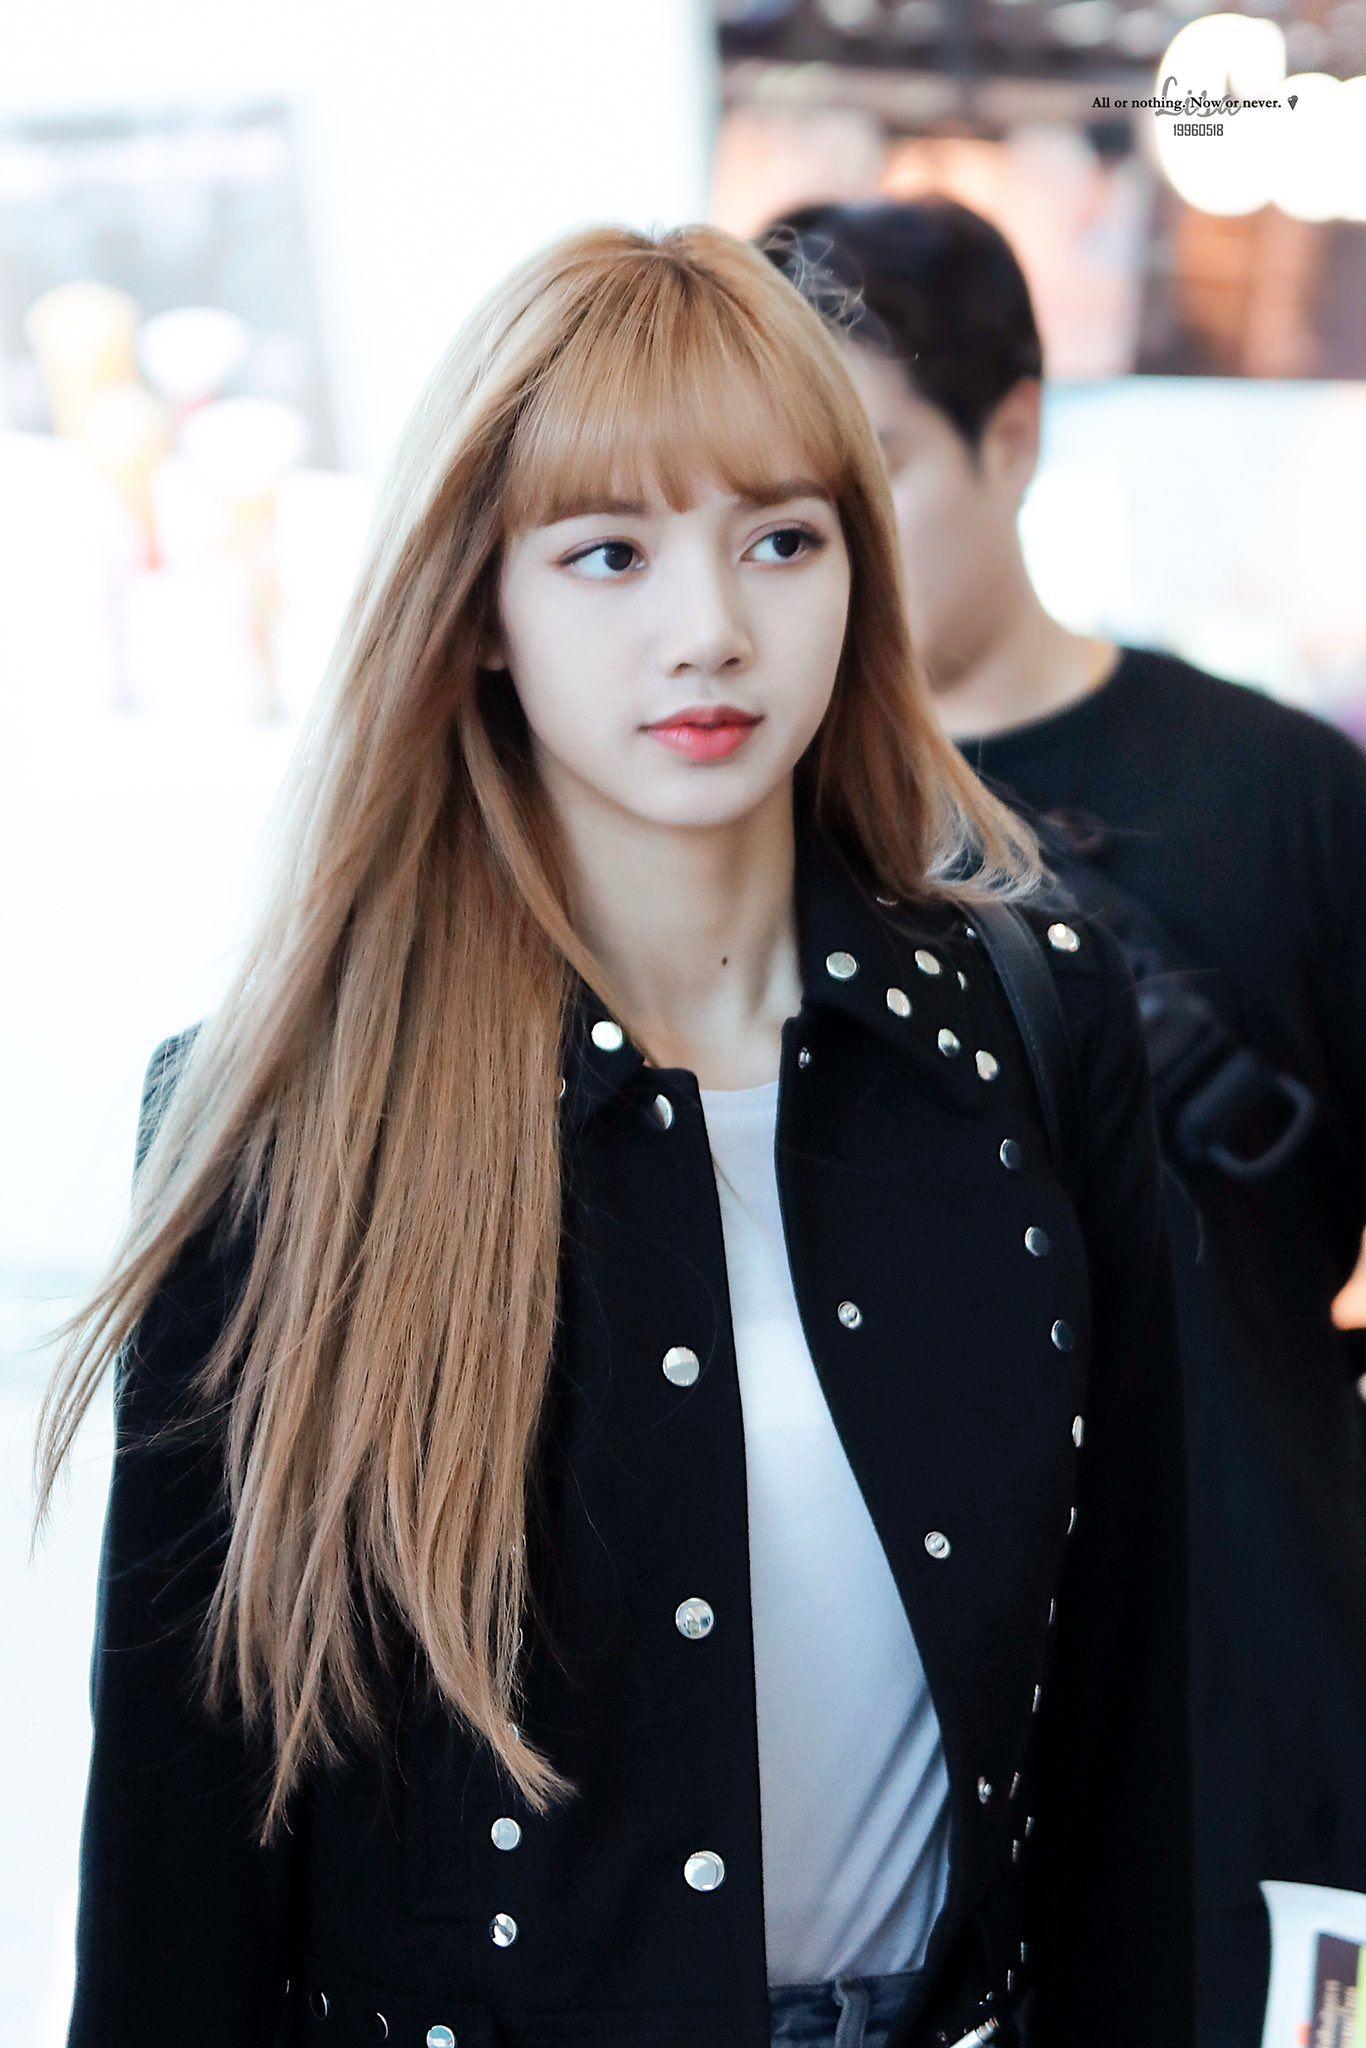 19960518 On Twitter Lalisa Manoban Blackpink Lisa Thailand Princess